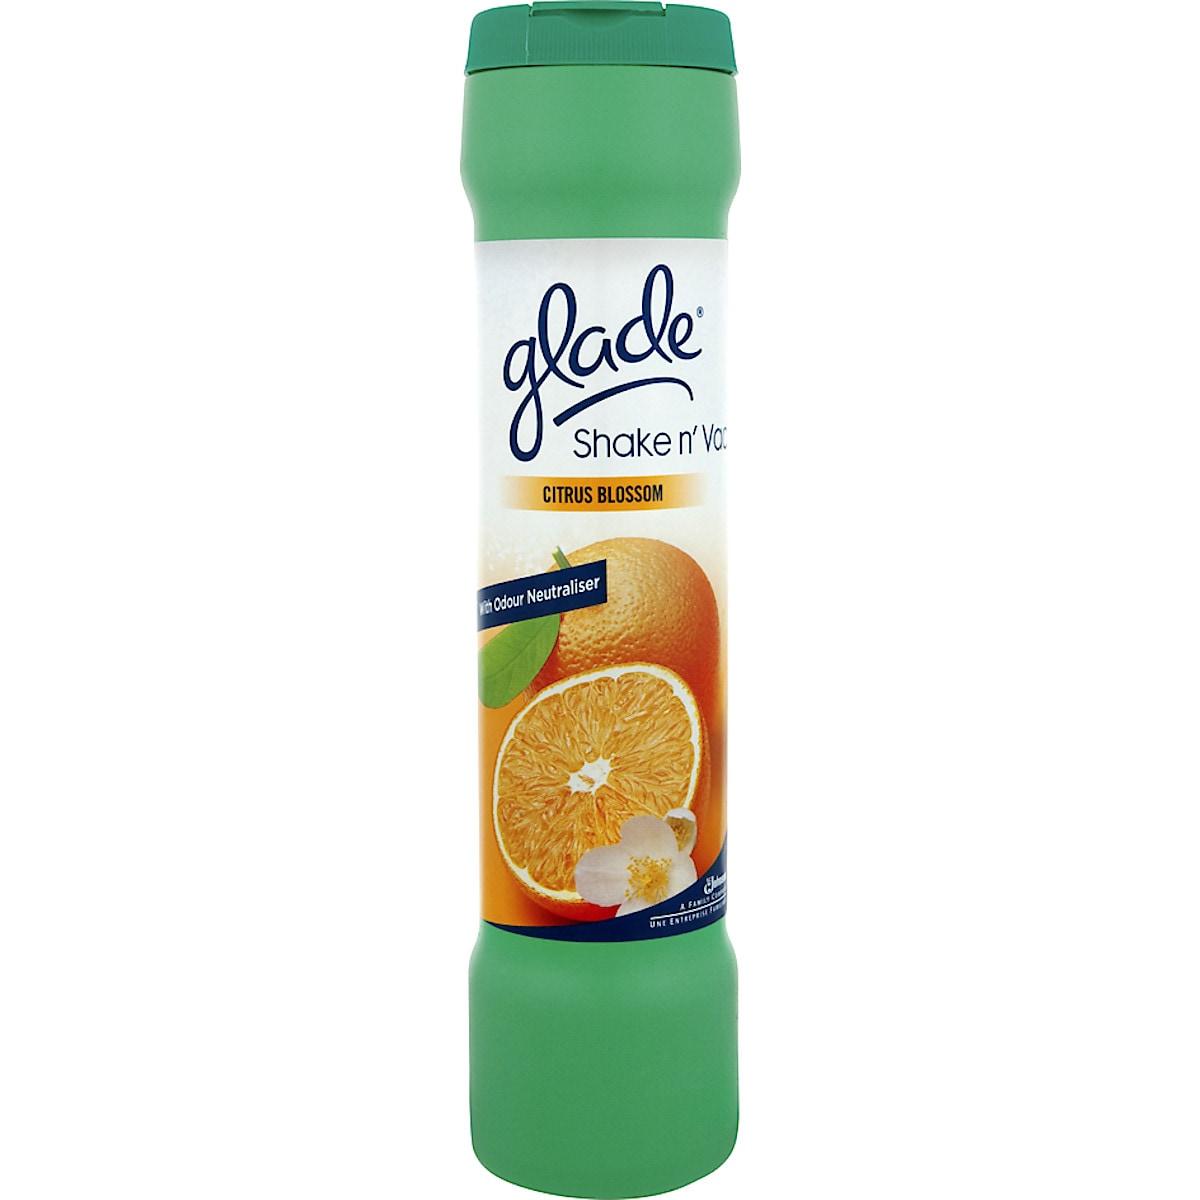 Glade Shake n' Vac Citrus Blossom